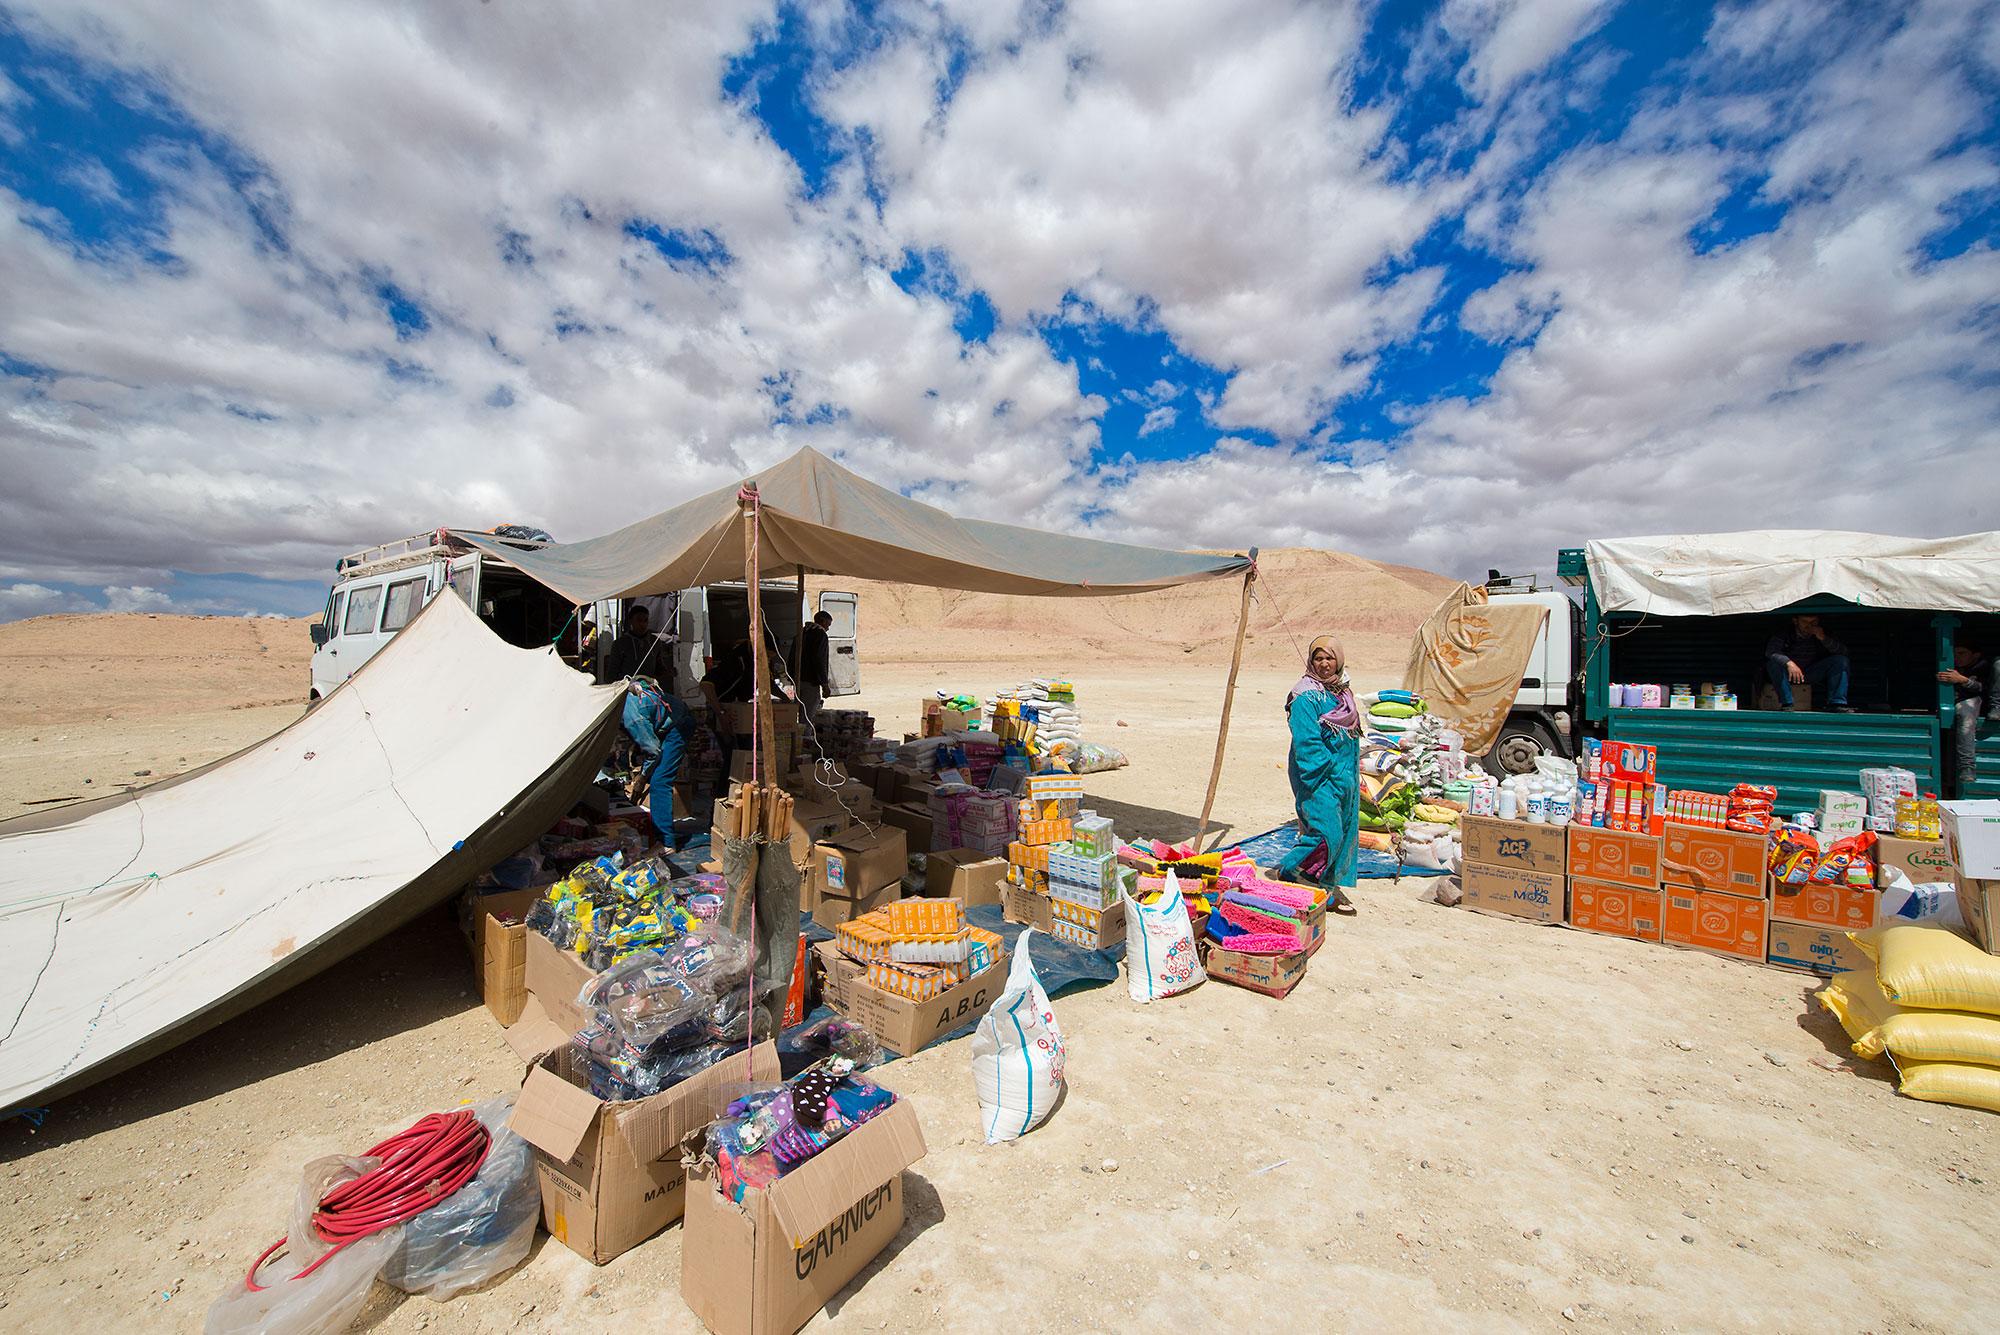 Street Market south of the Atlas Mountains Morocco